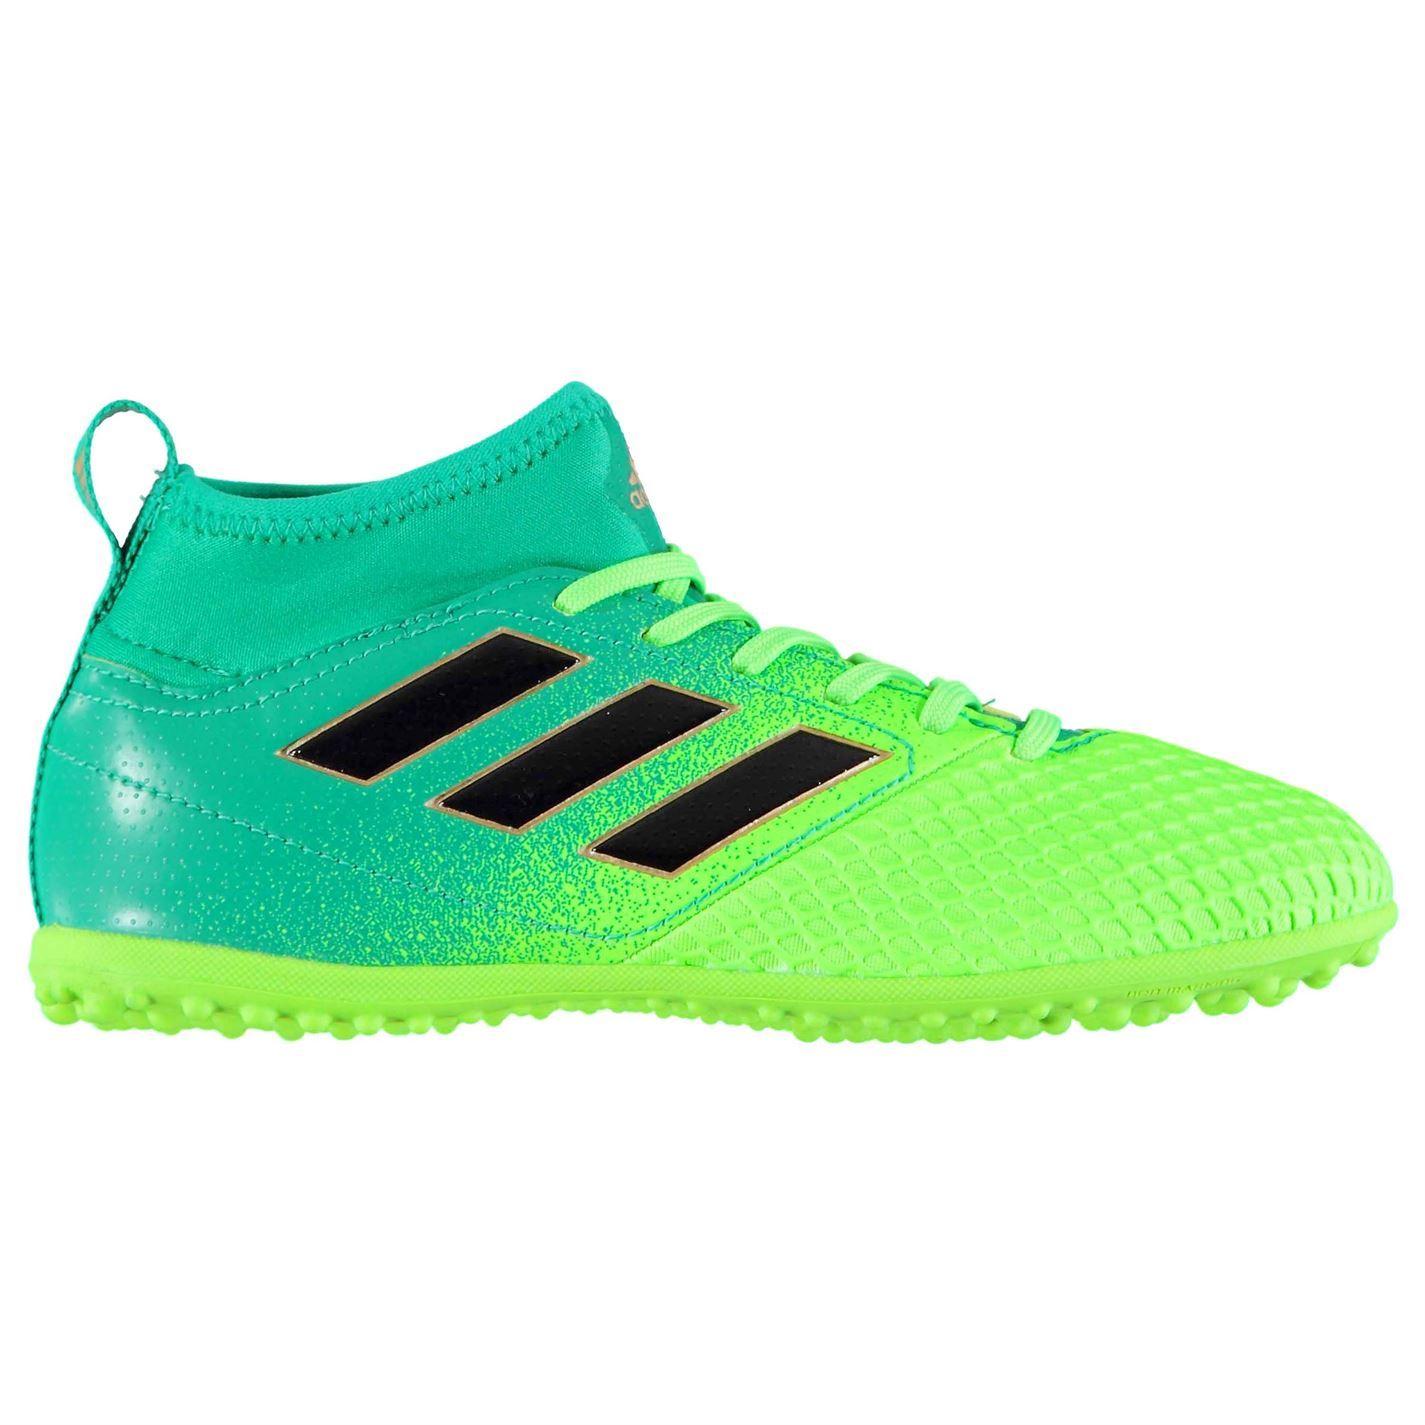 Ebay Uk Football Shoes